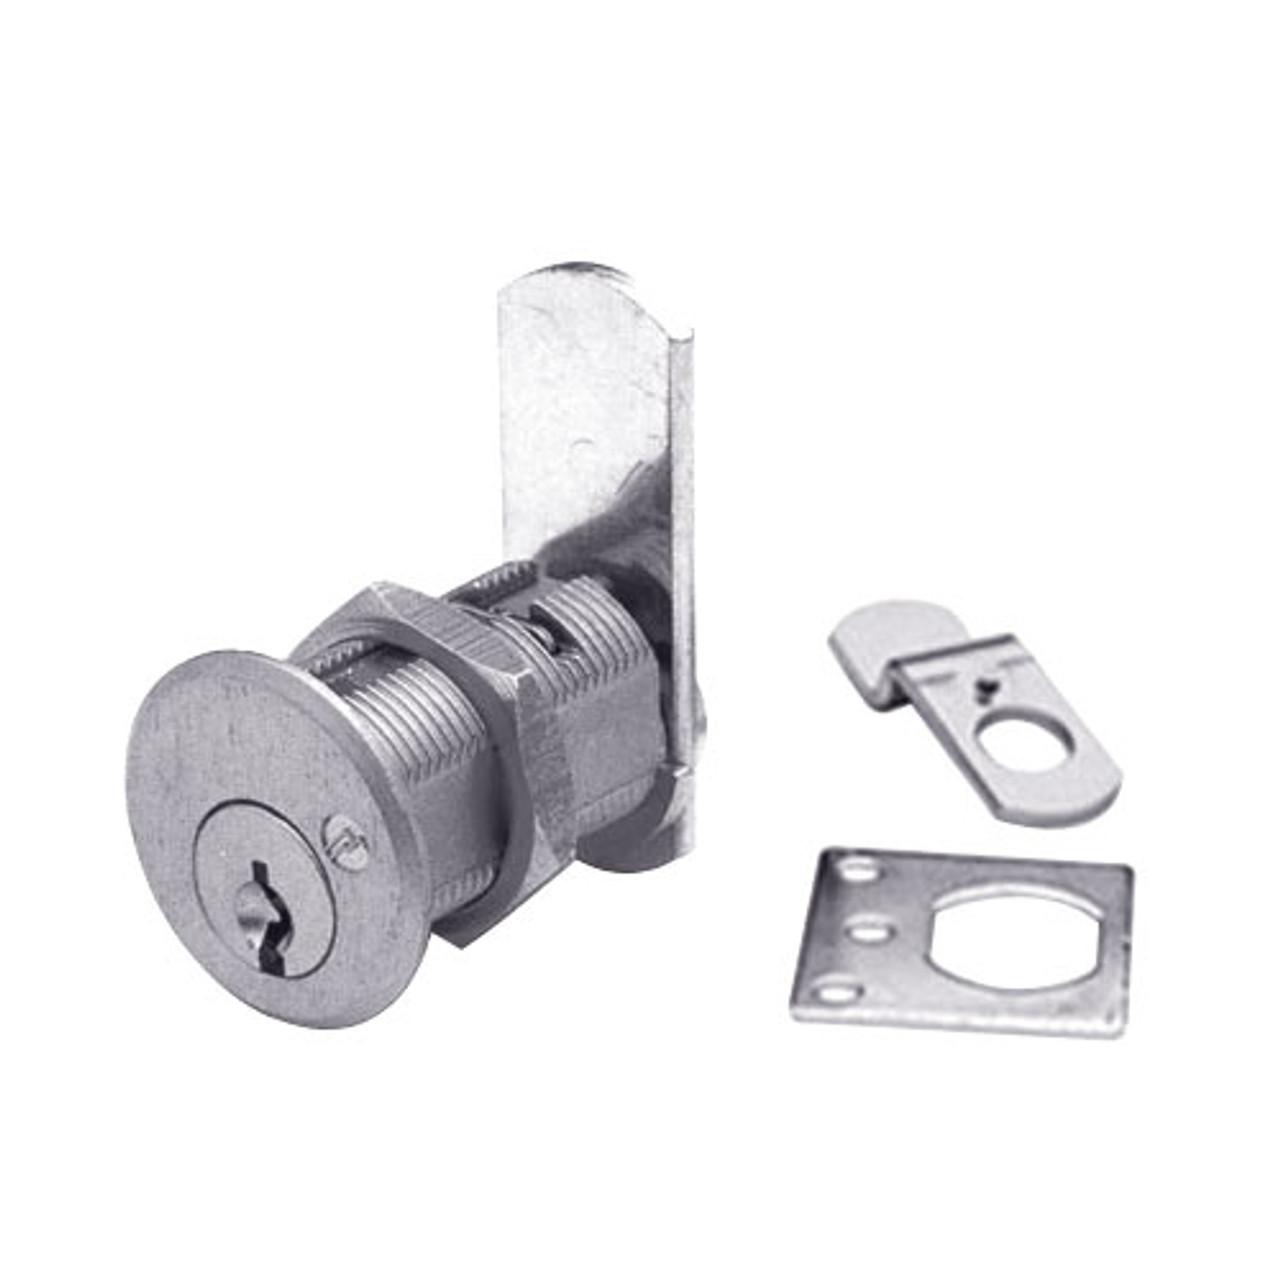 Olympus DCN3-KA107-26D Cam Locks in Satin Chrome Finish